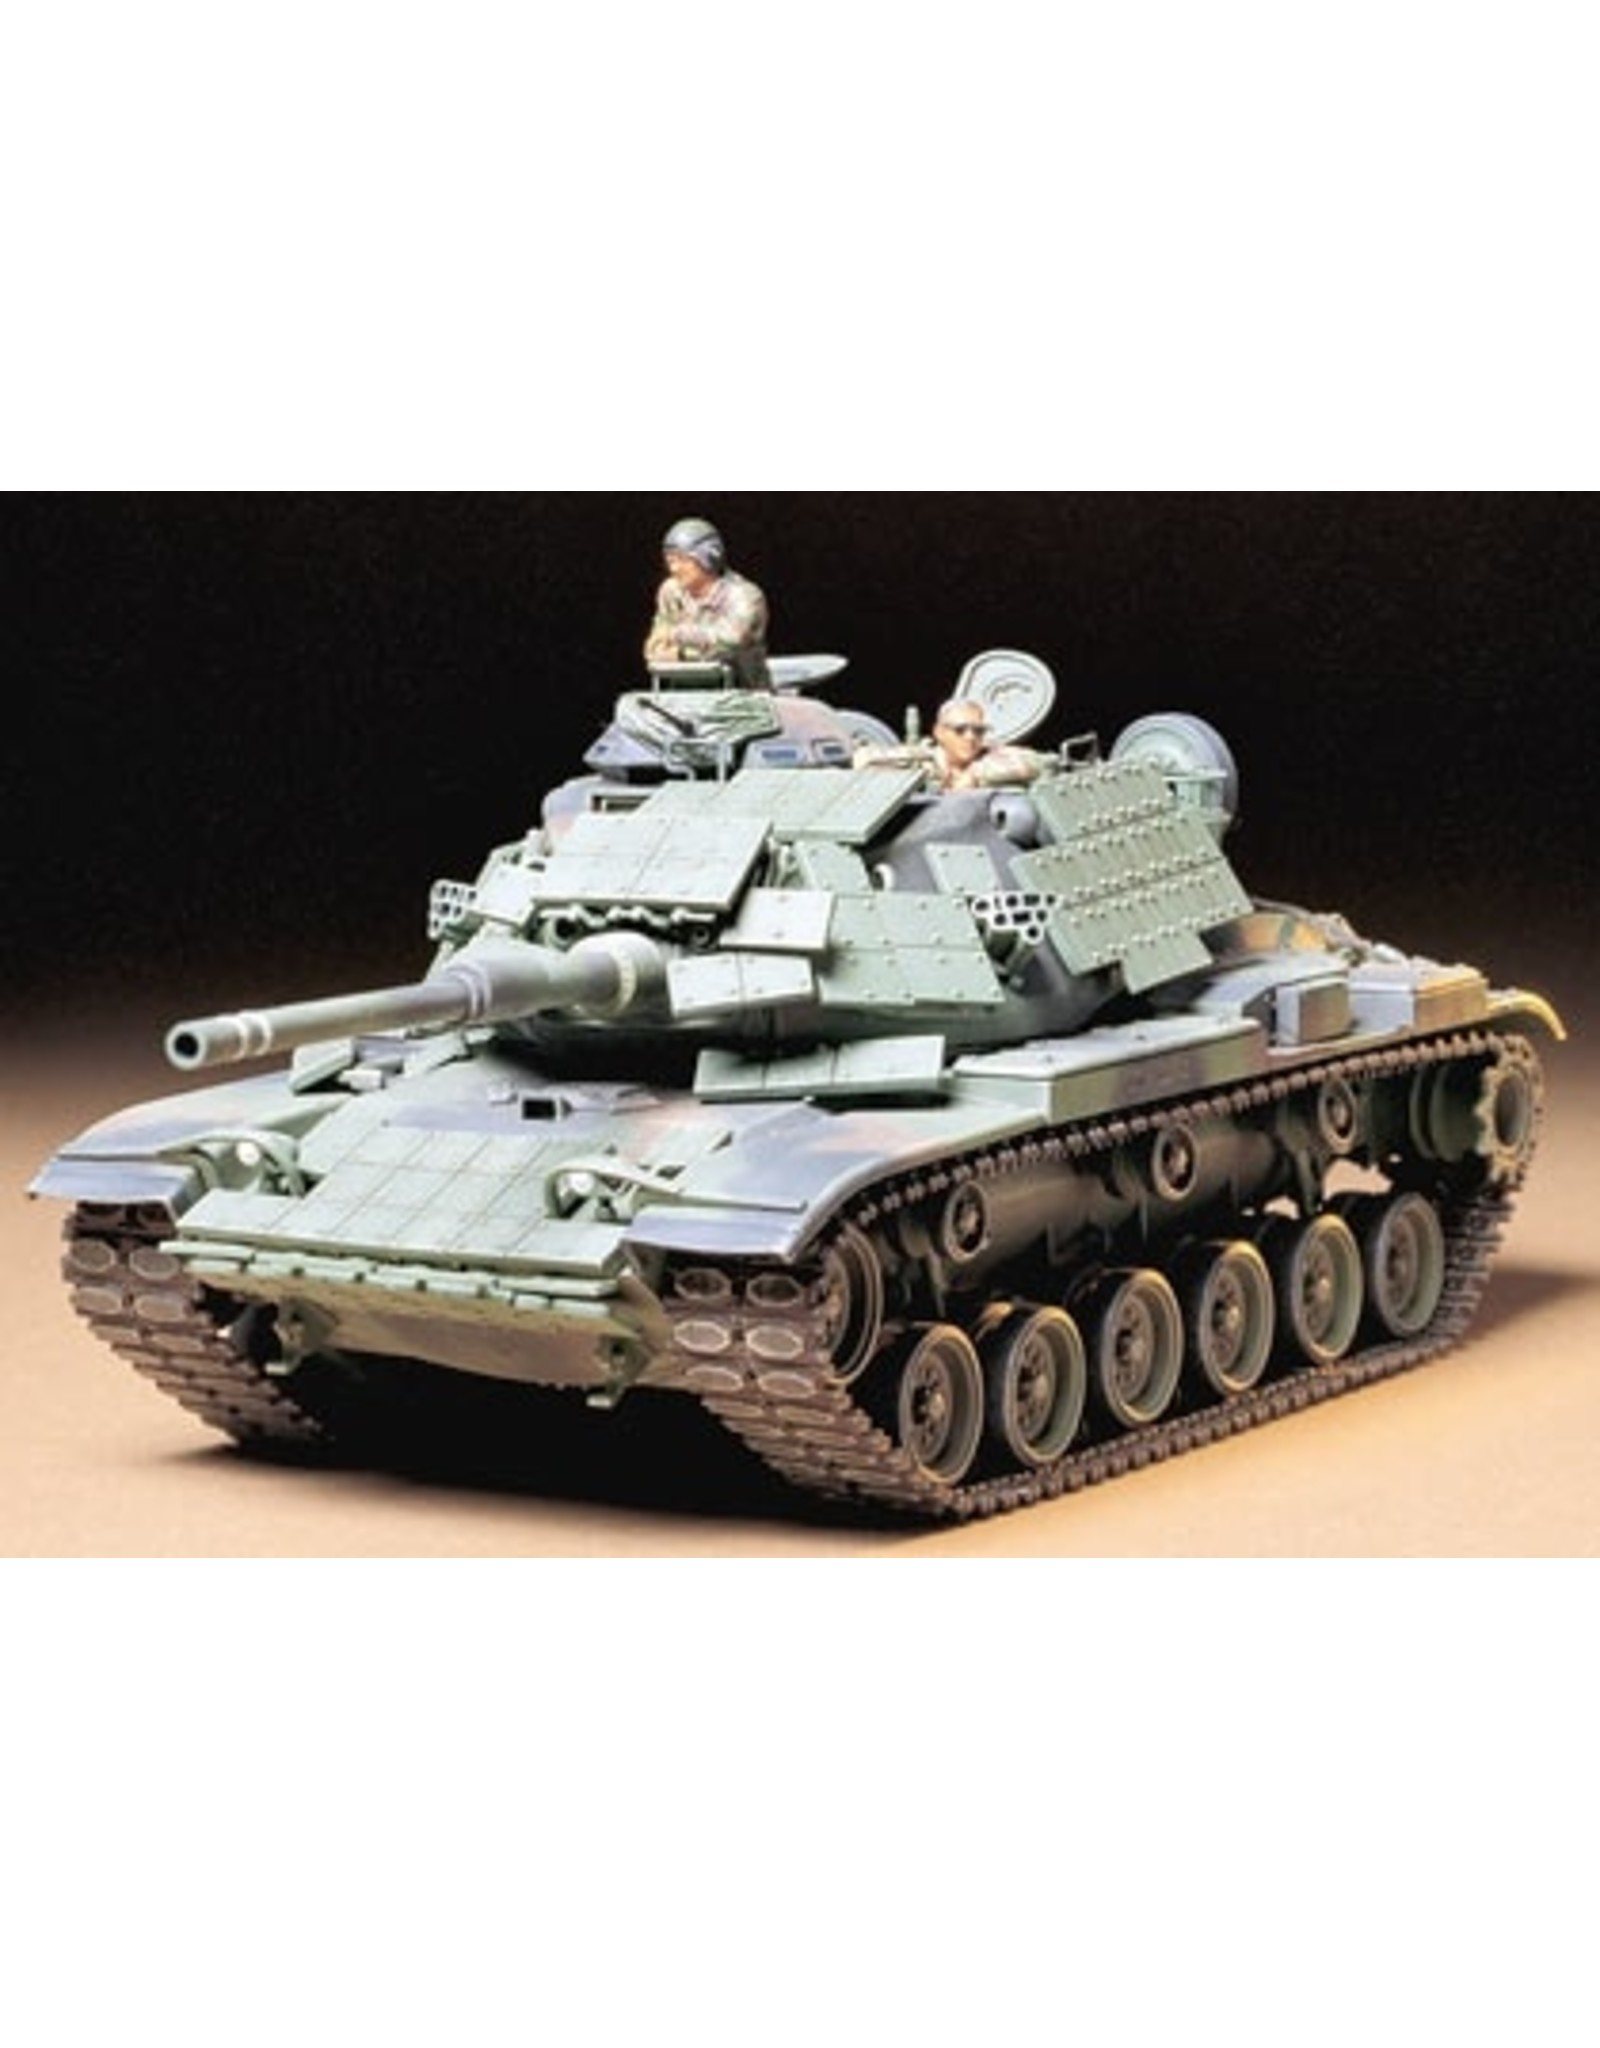 Tamiya 35157 - 1/35 U.S. Marine M60A1